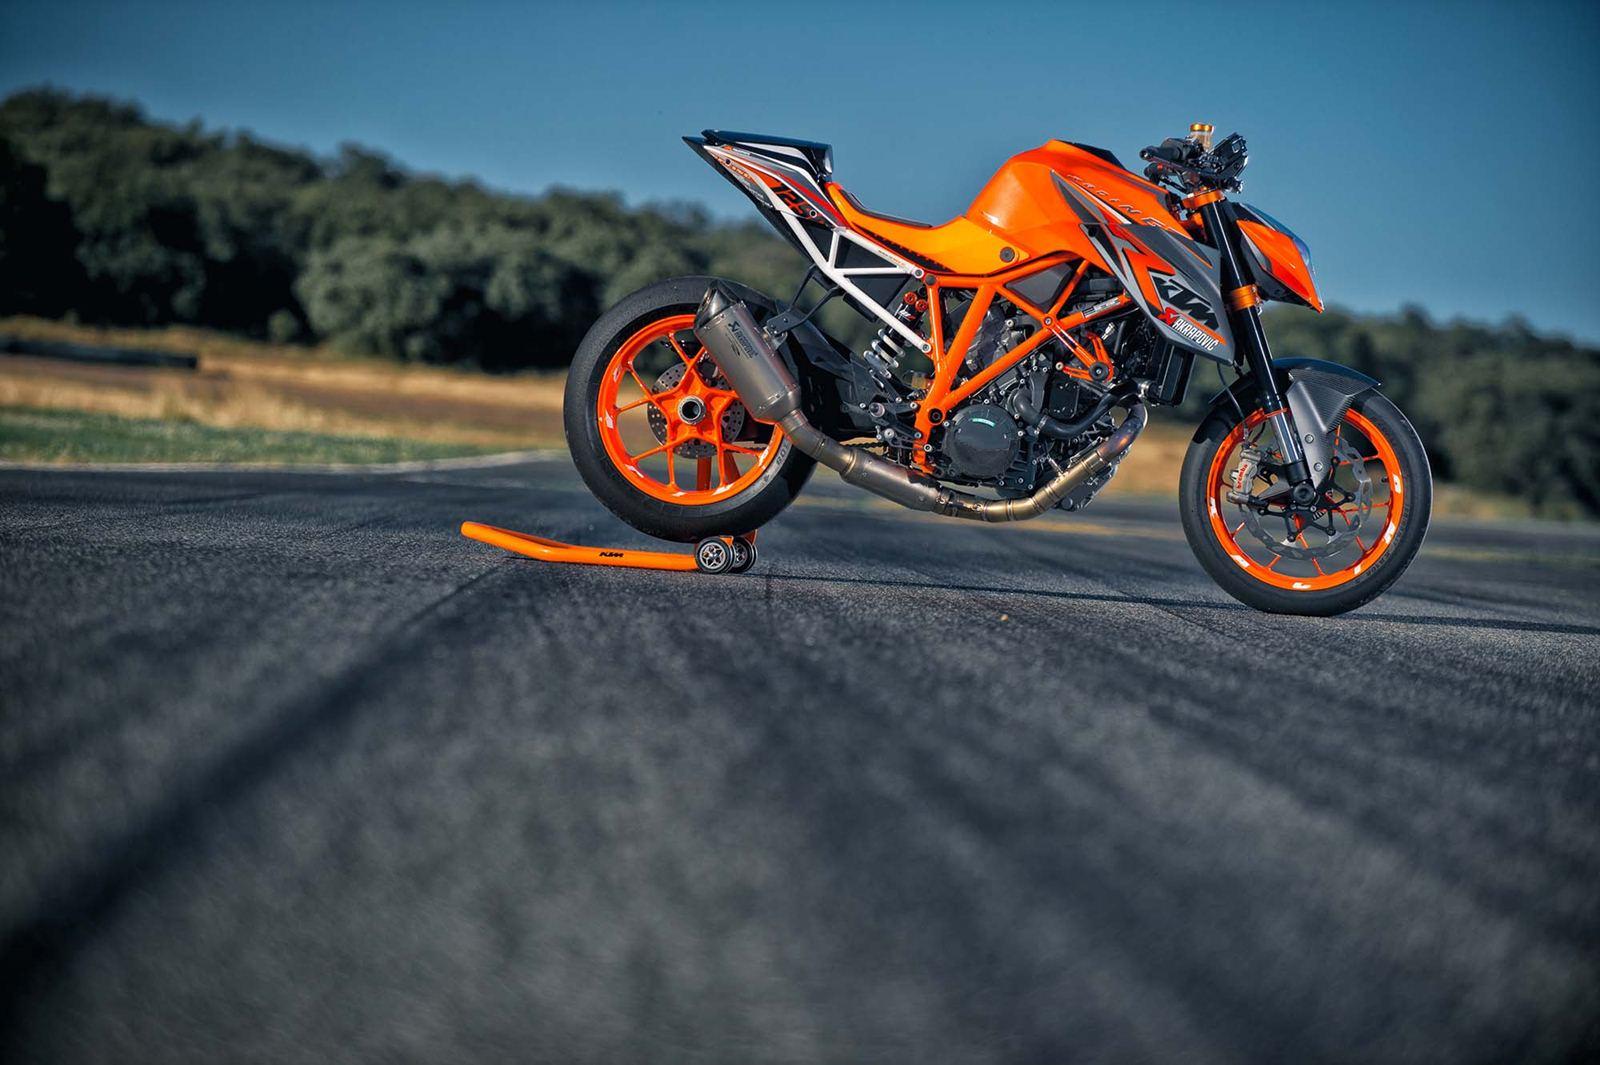 Download Orange KTM Bike Wallpaper Photos 60897 1600x1065 px High 1600x1065